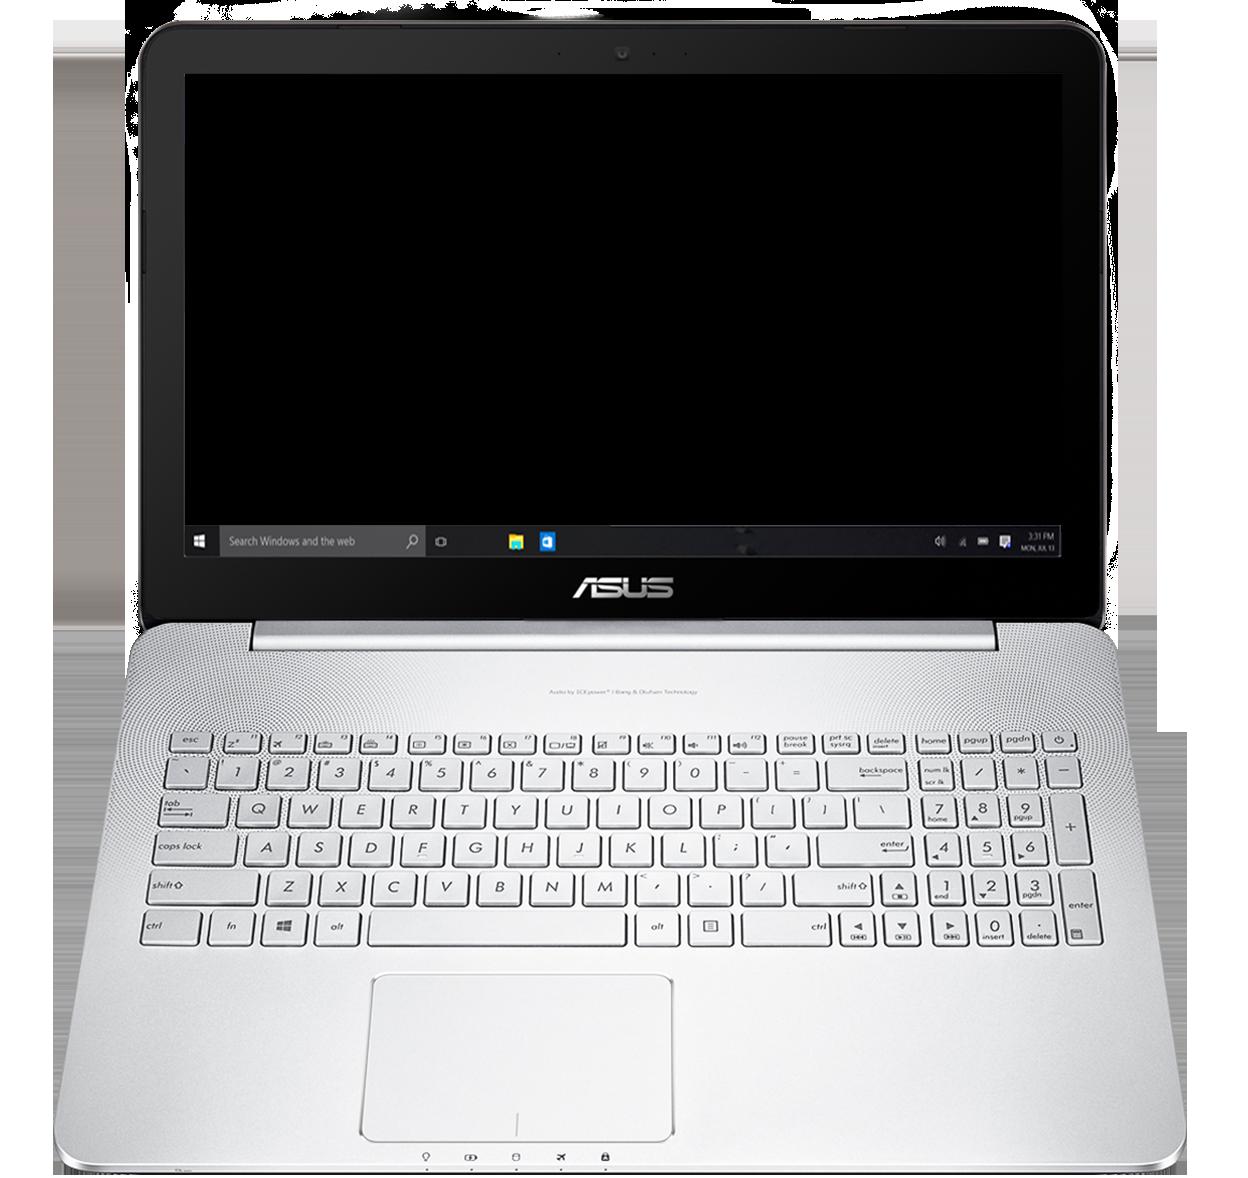 ASUS VivoBook Pro N552VX USB Charger Plus Update